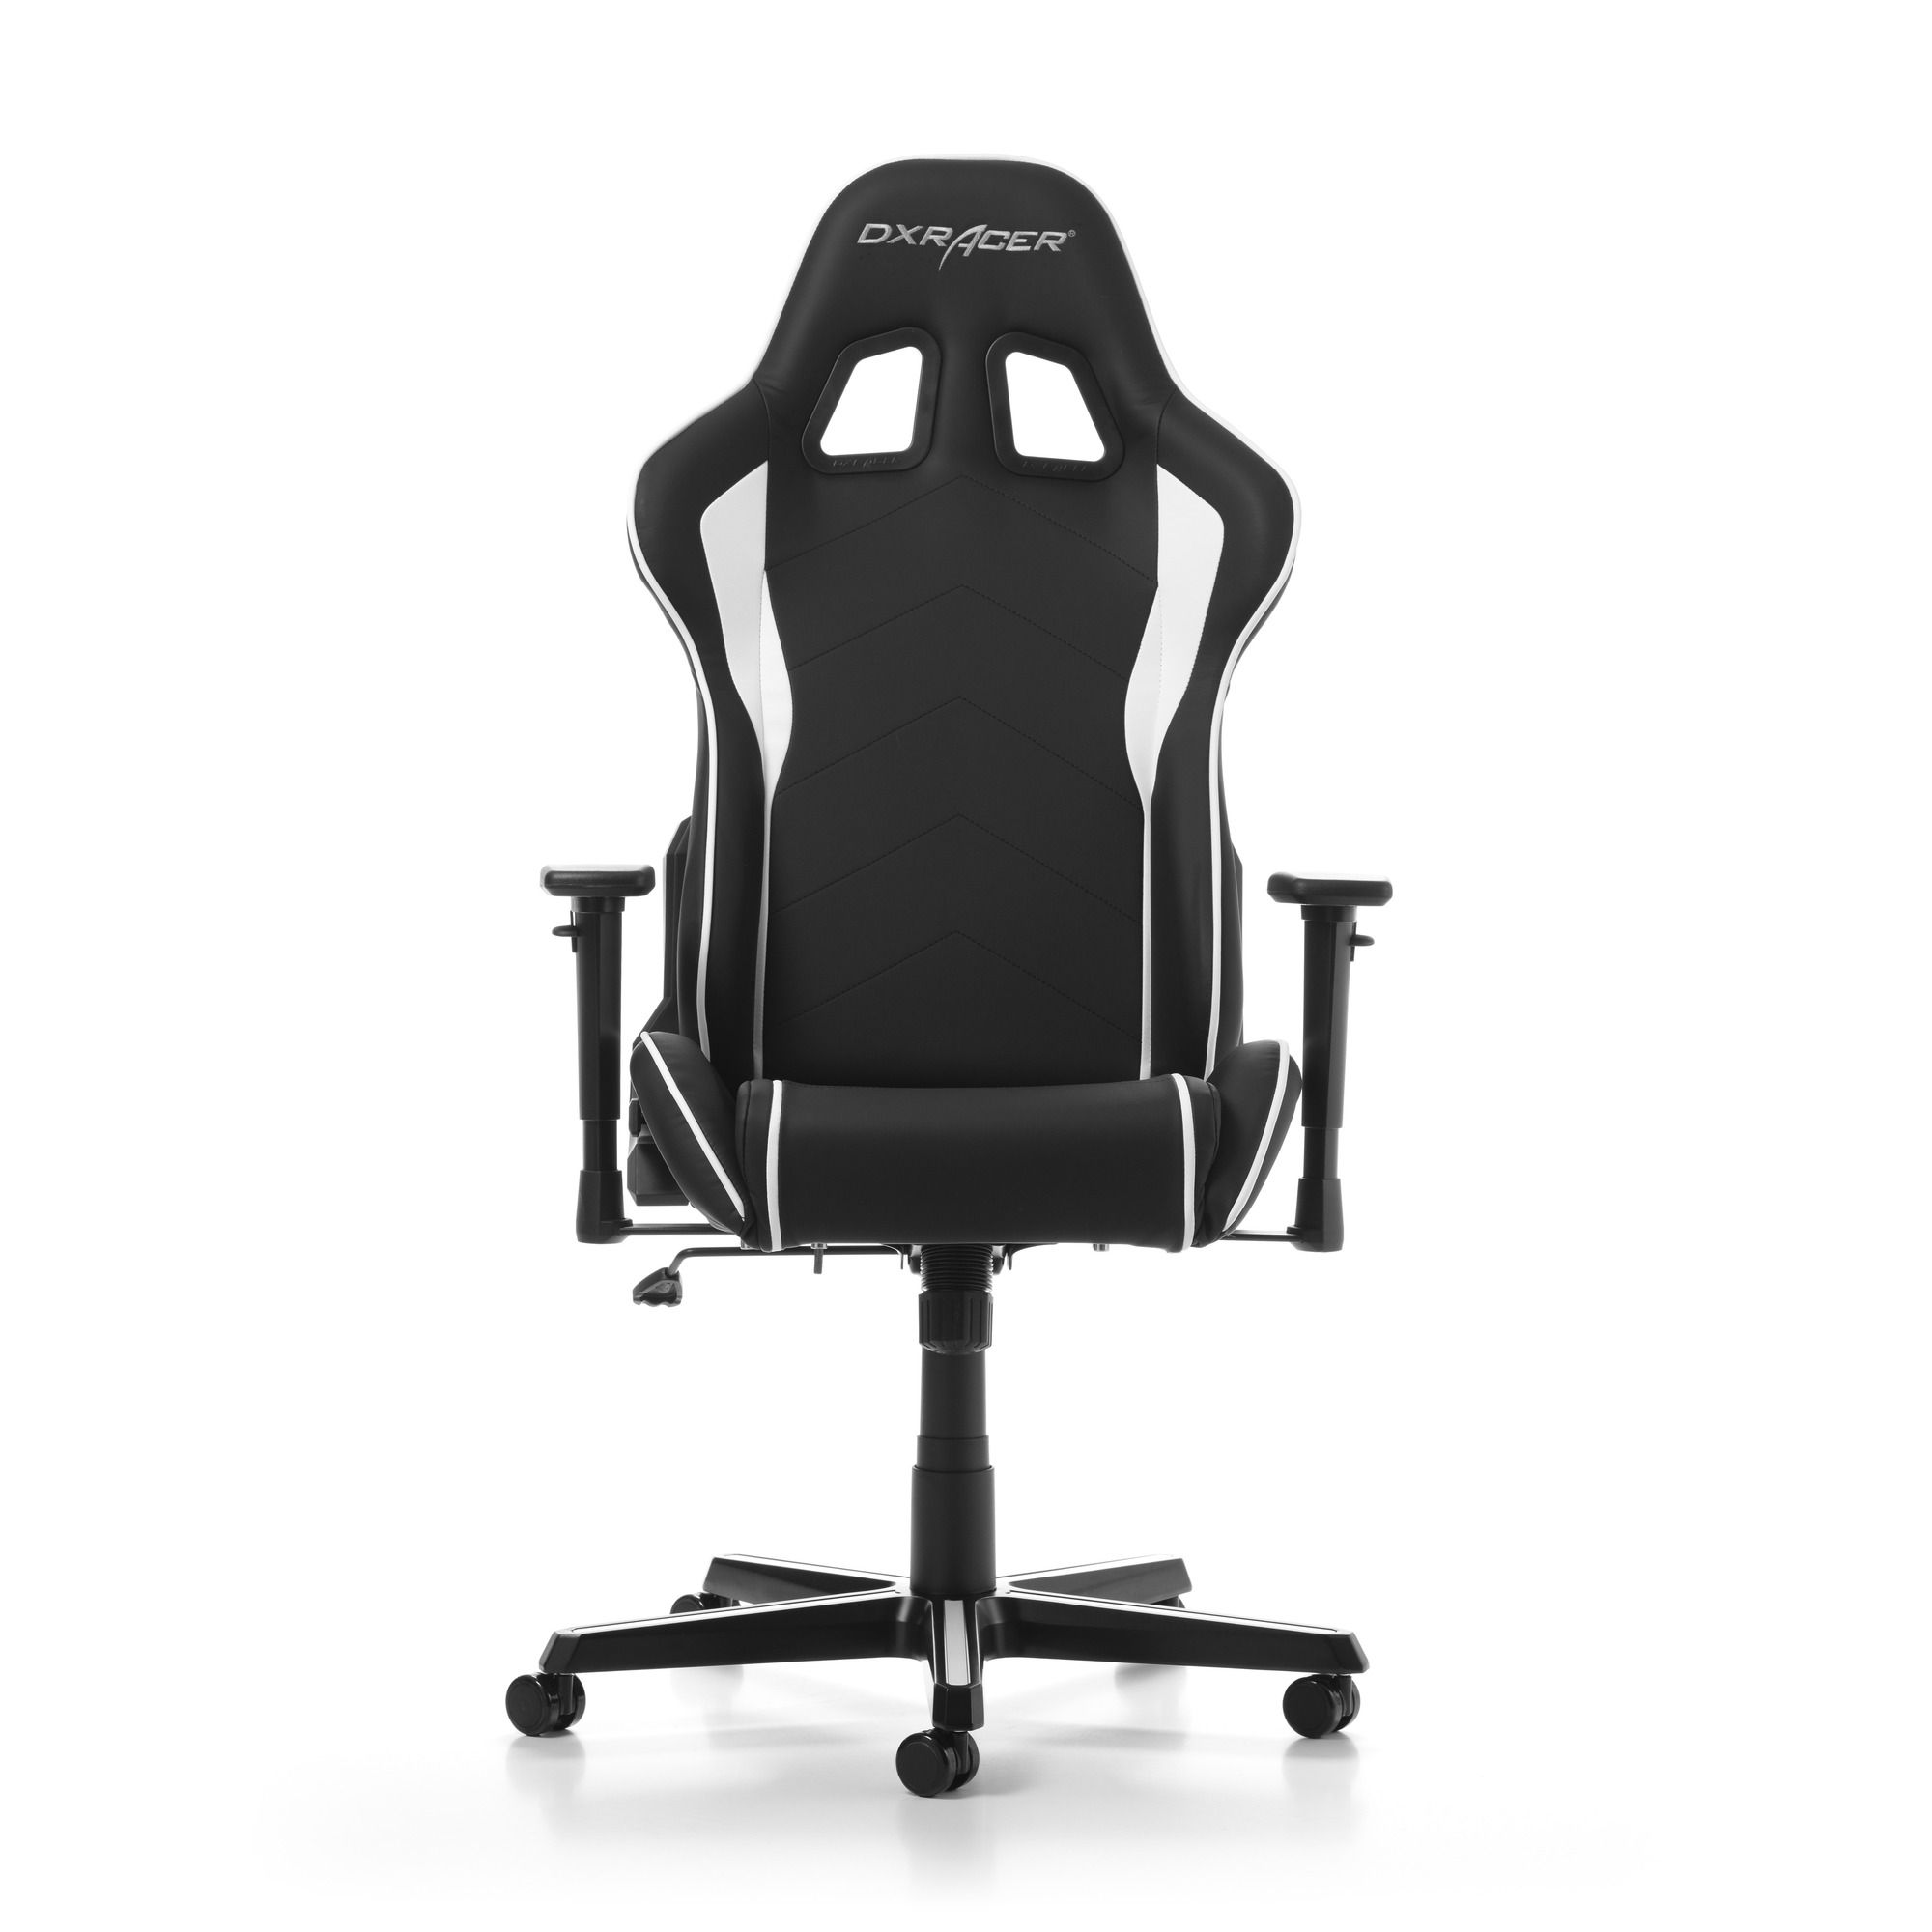 Гейминг стол DXRacer OH/FH08/NW - серия FORMULA, черен/бял - 7